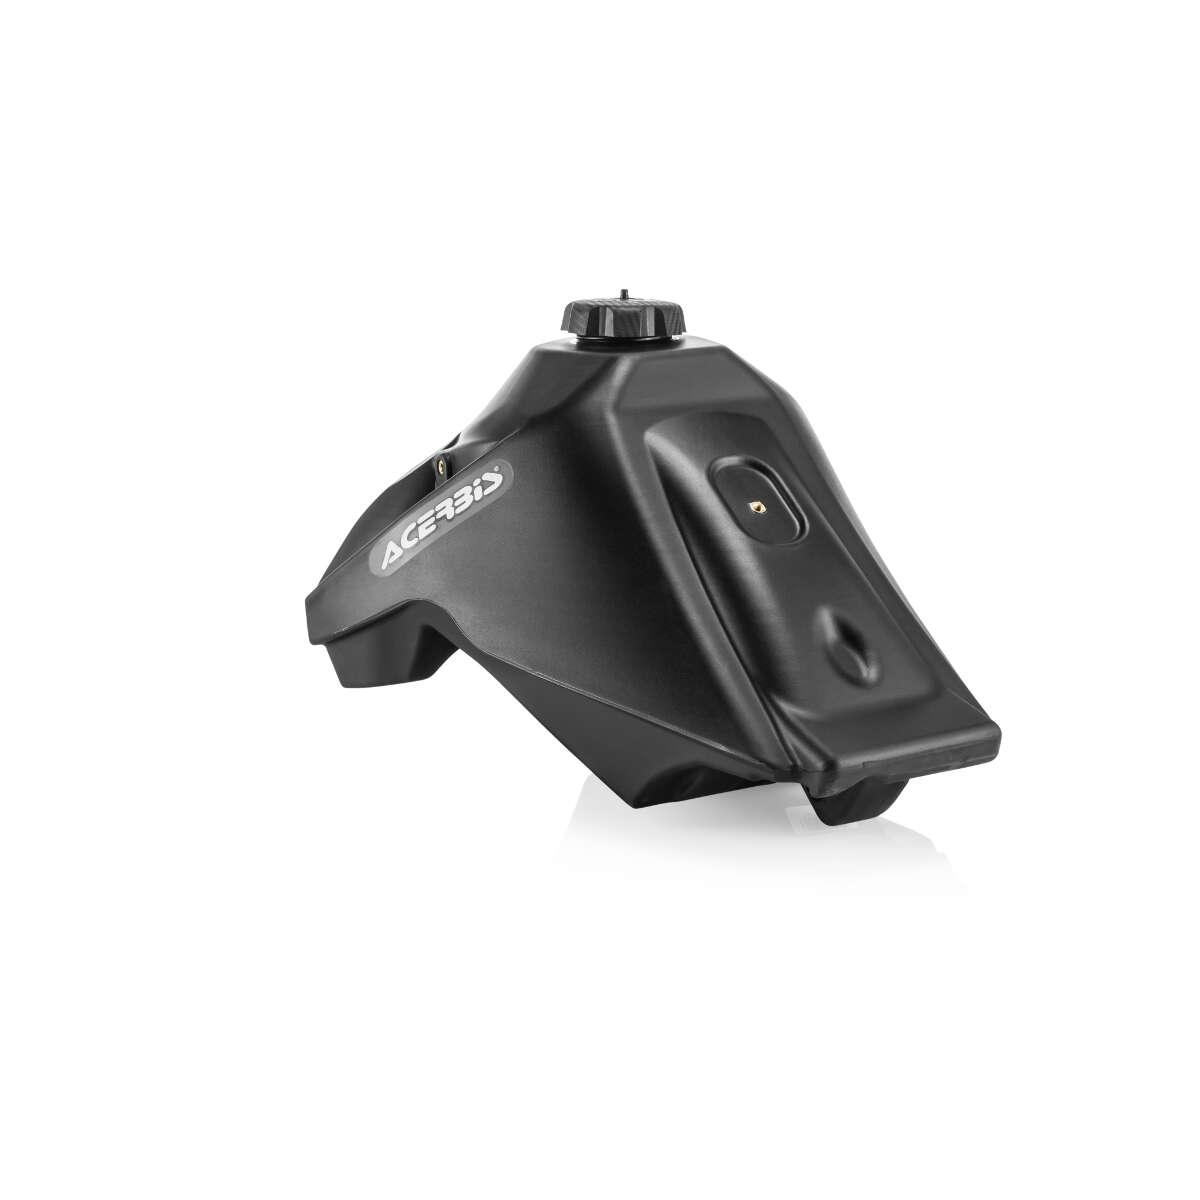 Acerbis Tank  Black, 12.5 L, Honda CRF 250 L-M 2017/2018